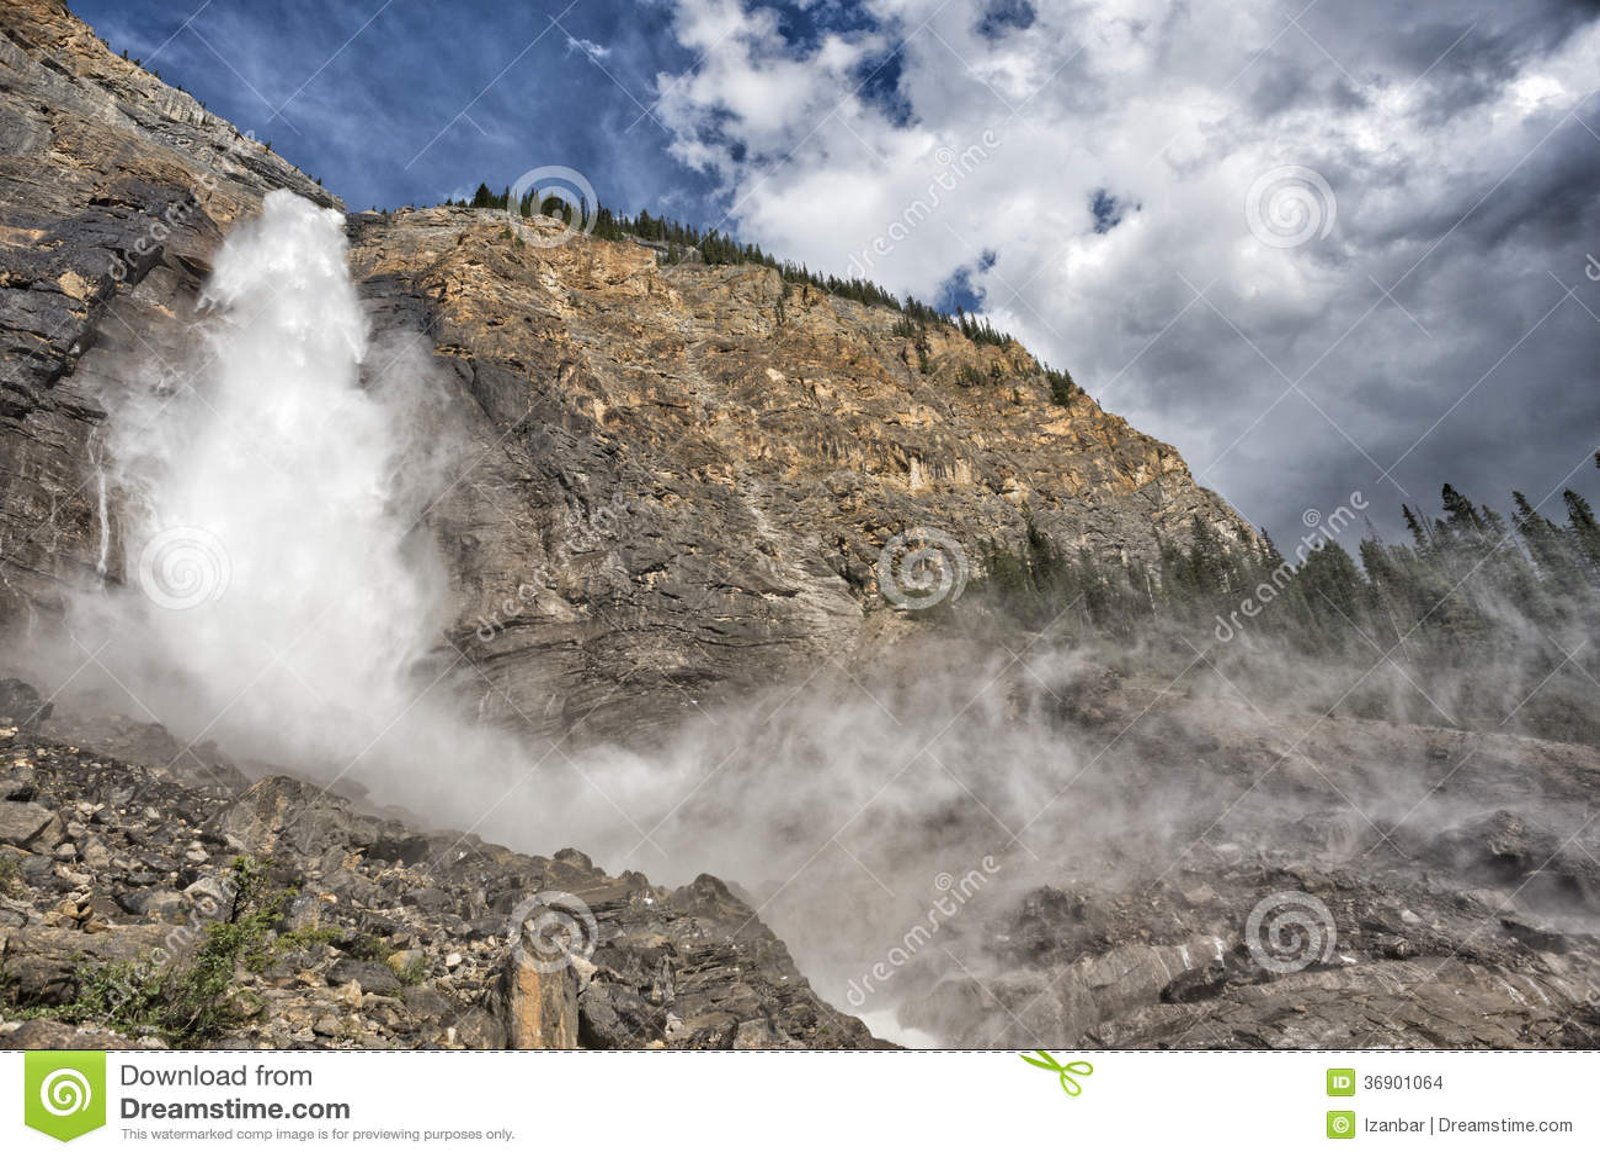 Kanada Skalistych gór panorama